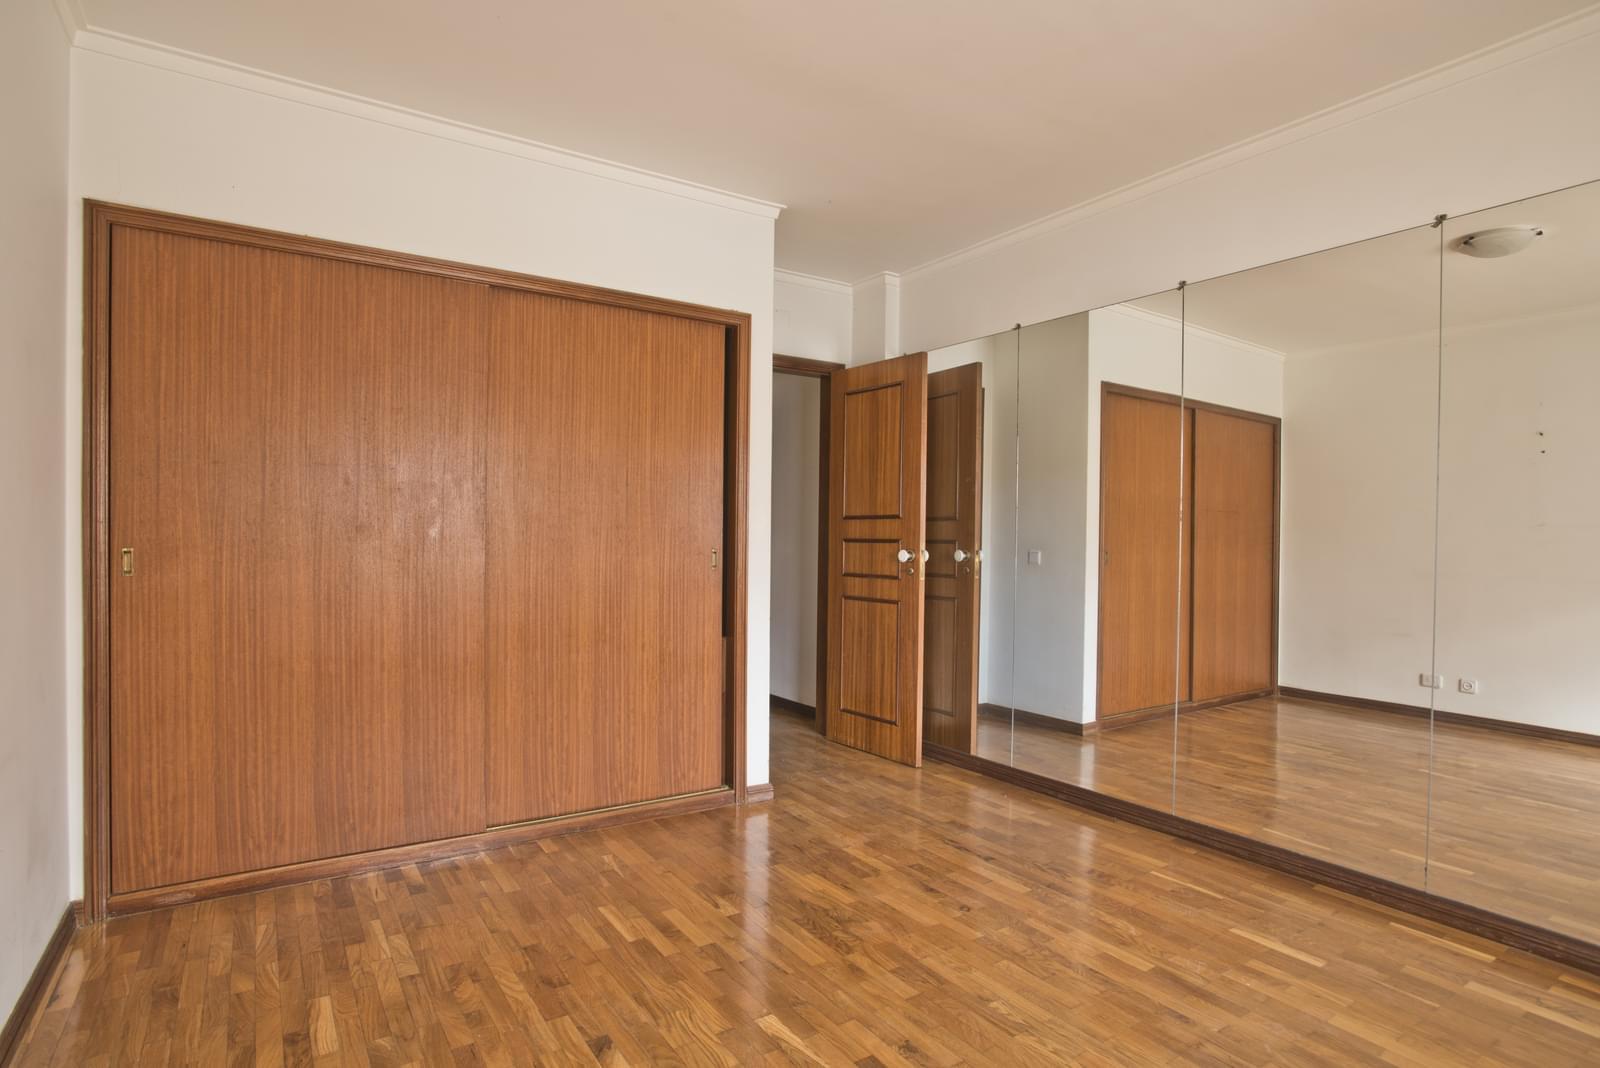 pf17280-apartamento-t2-cascais-6d3fbd84-d4f3-4e5e-b62c-743ca14f170a